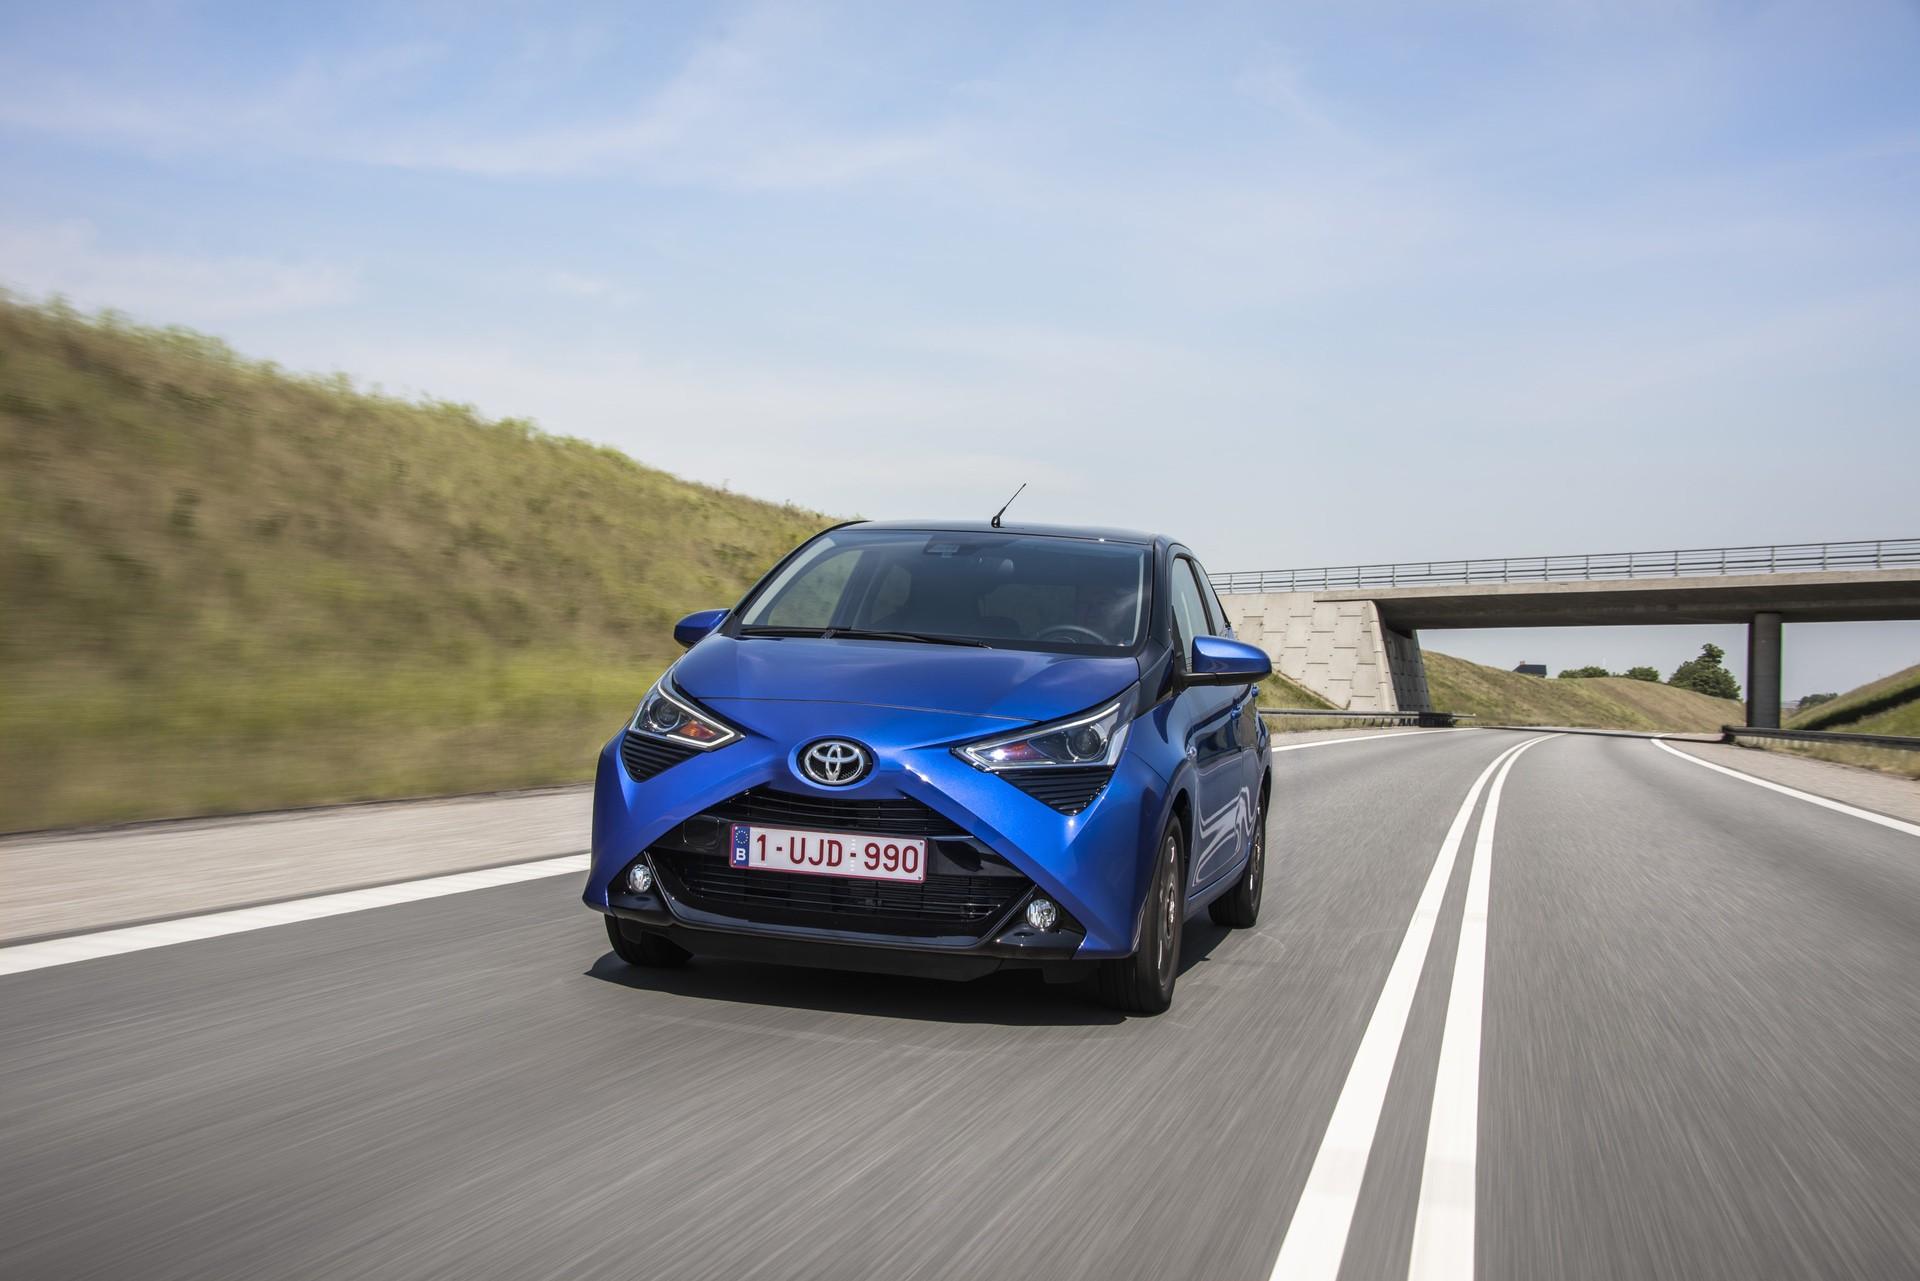 Toyota_Aygo_facelift_presskit_0008